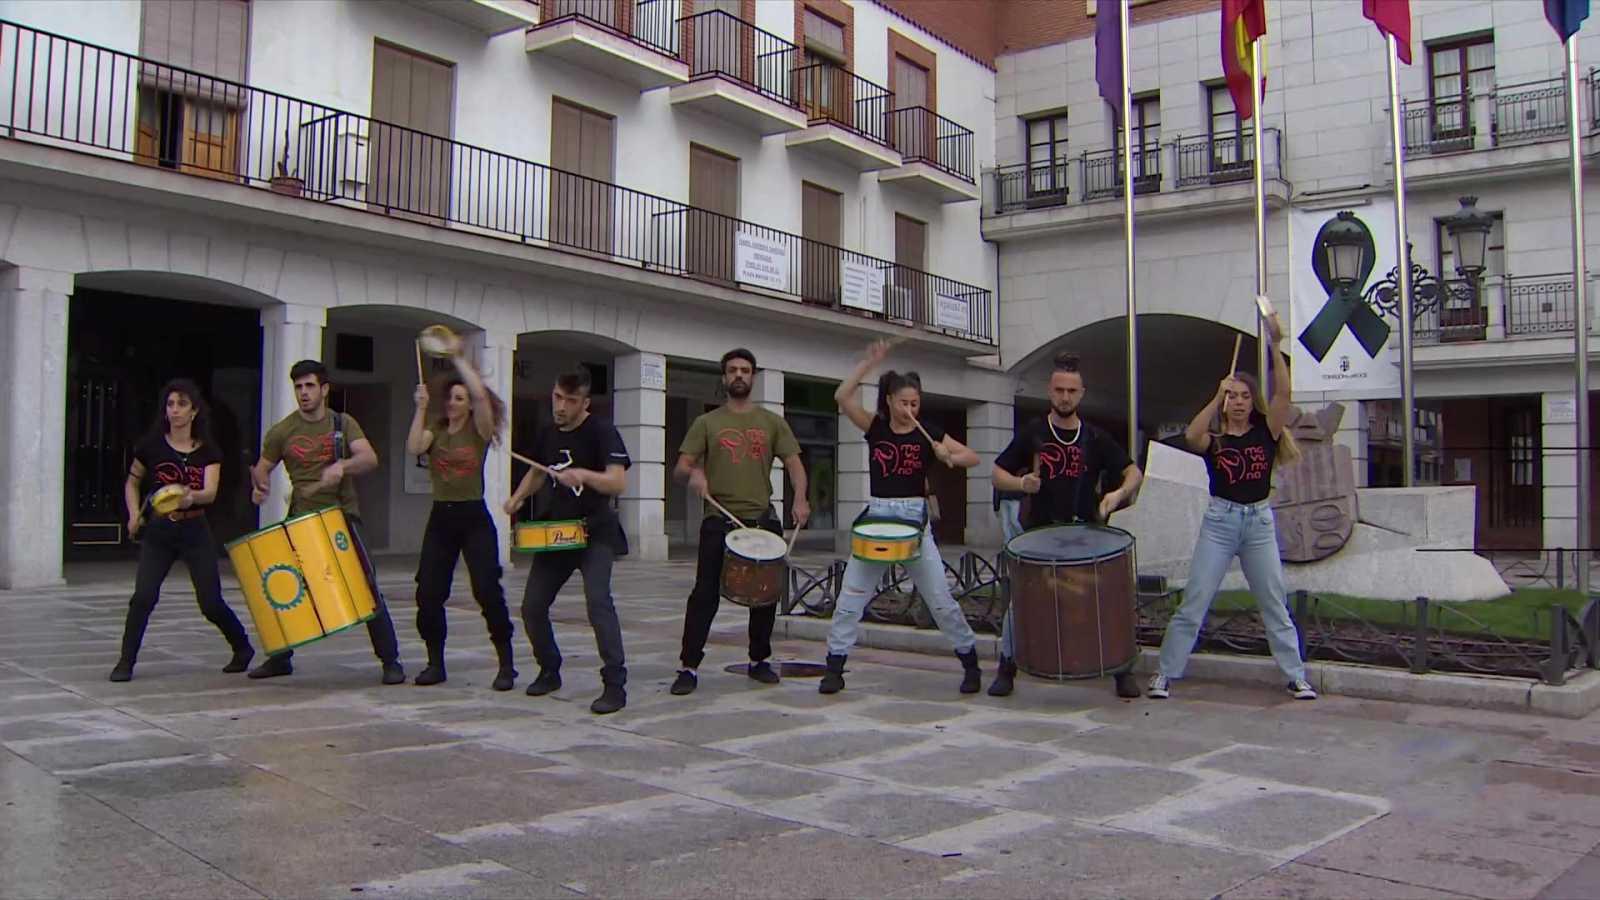 Mayumana comienza su gira en España